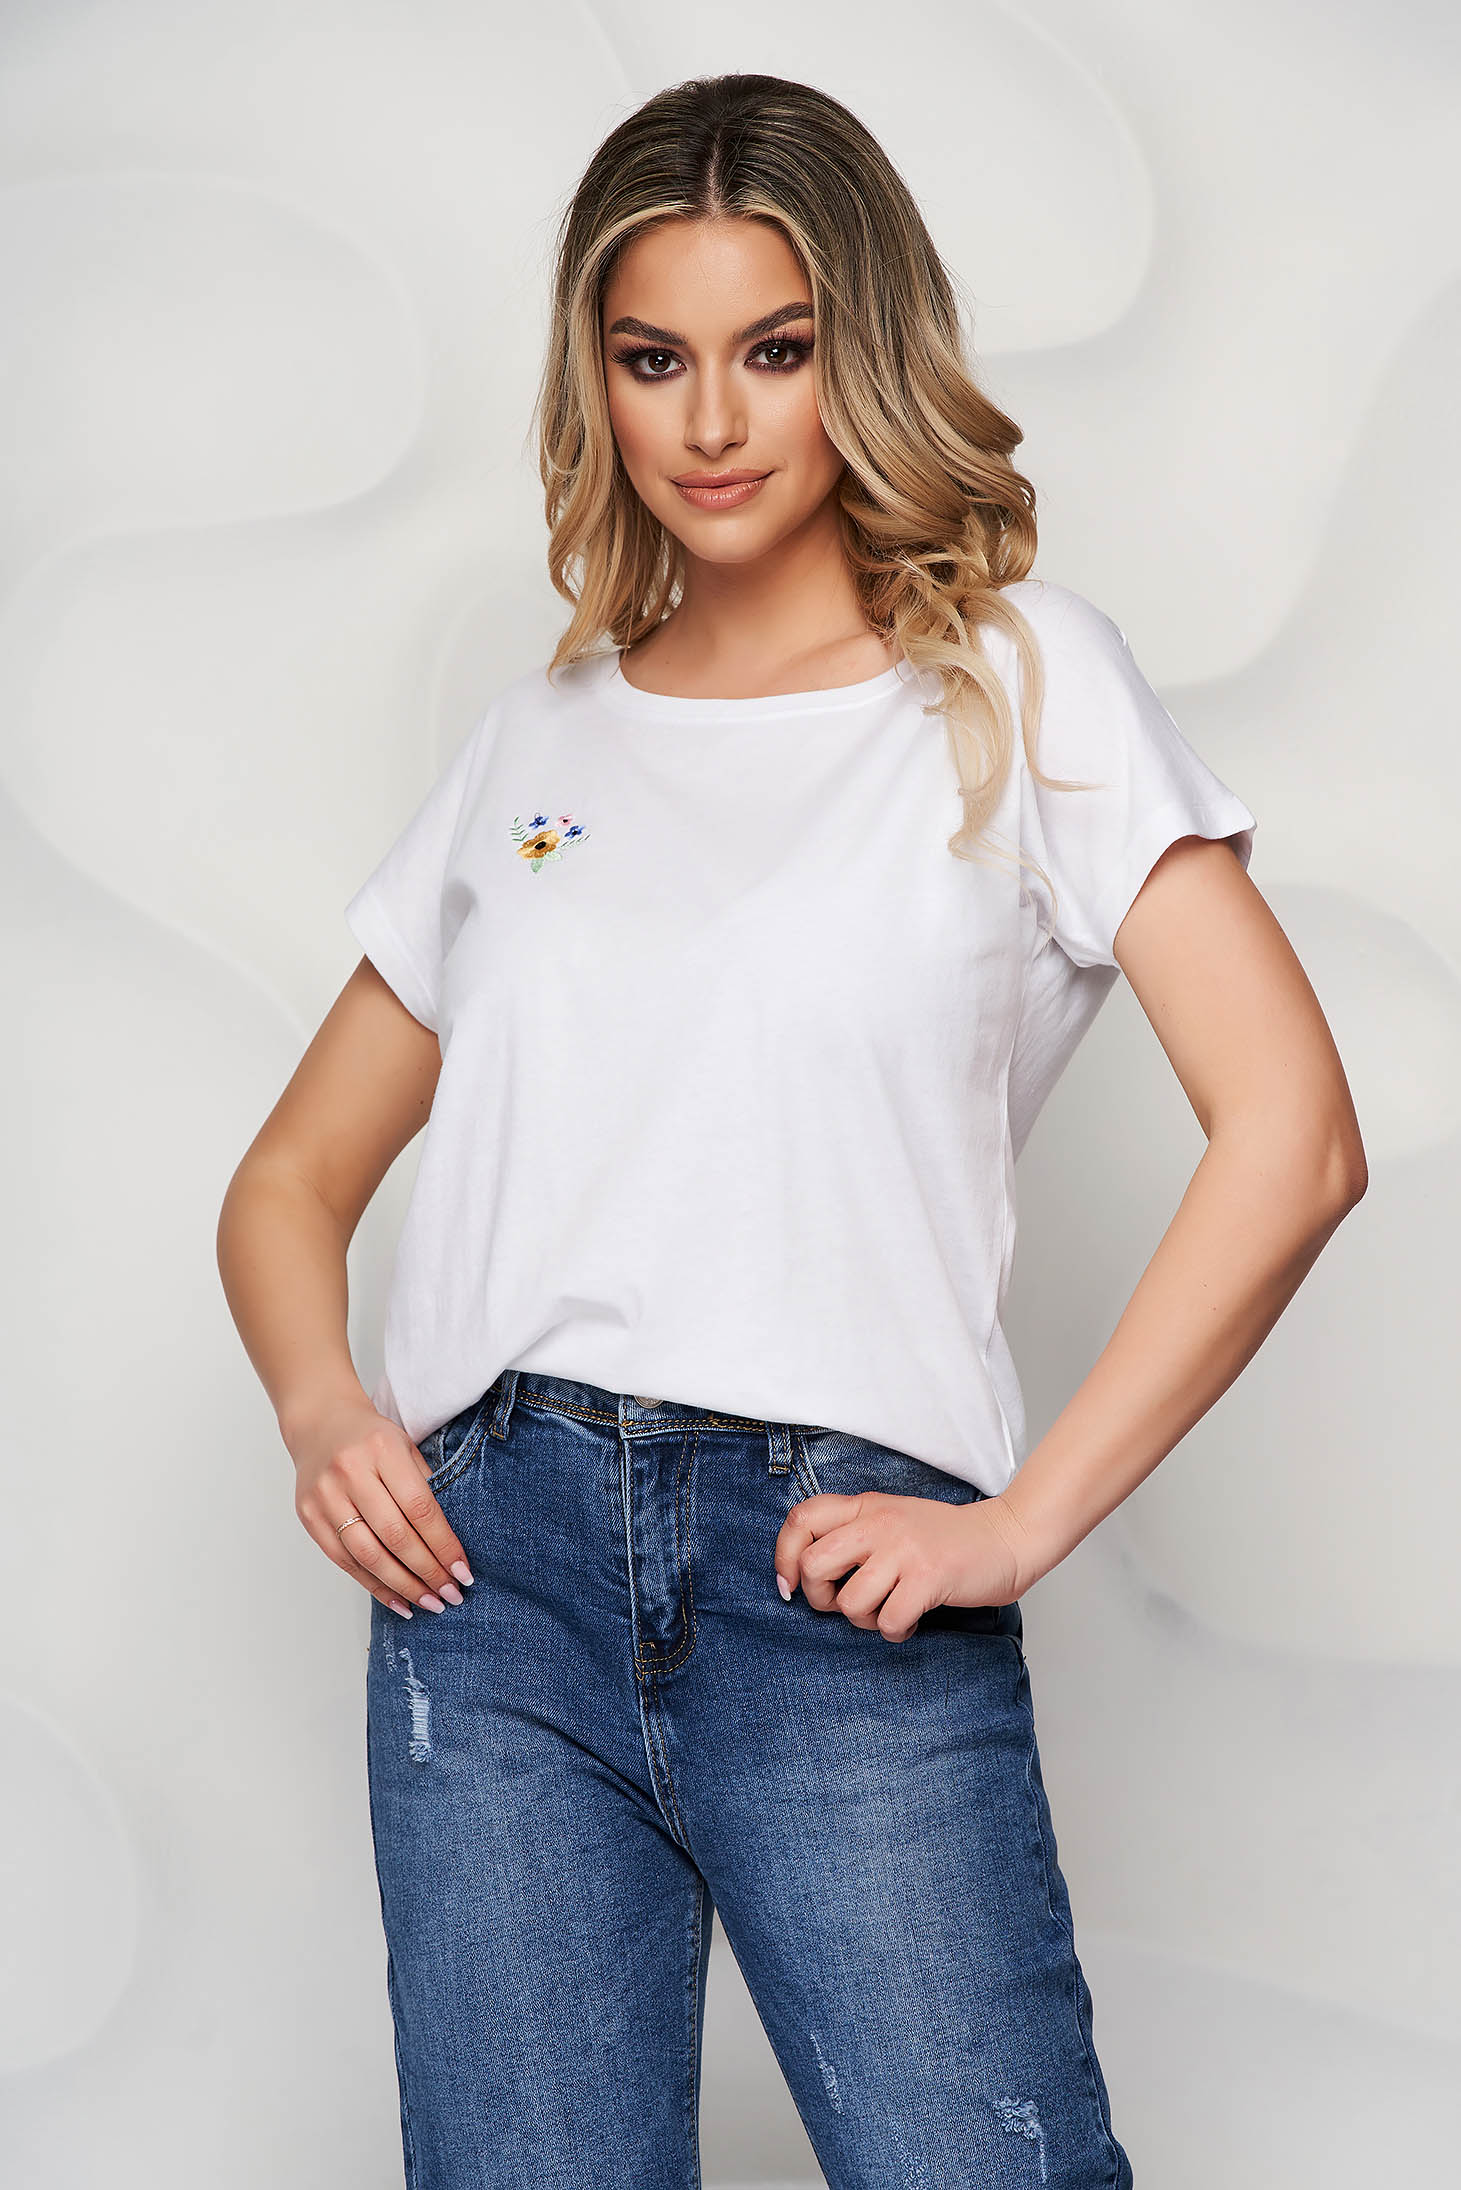 Tricou StarShinerS alb din bumbac usor elastic cu croi larg si broderie florala